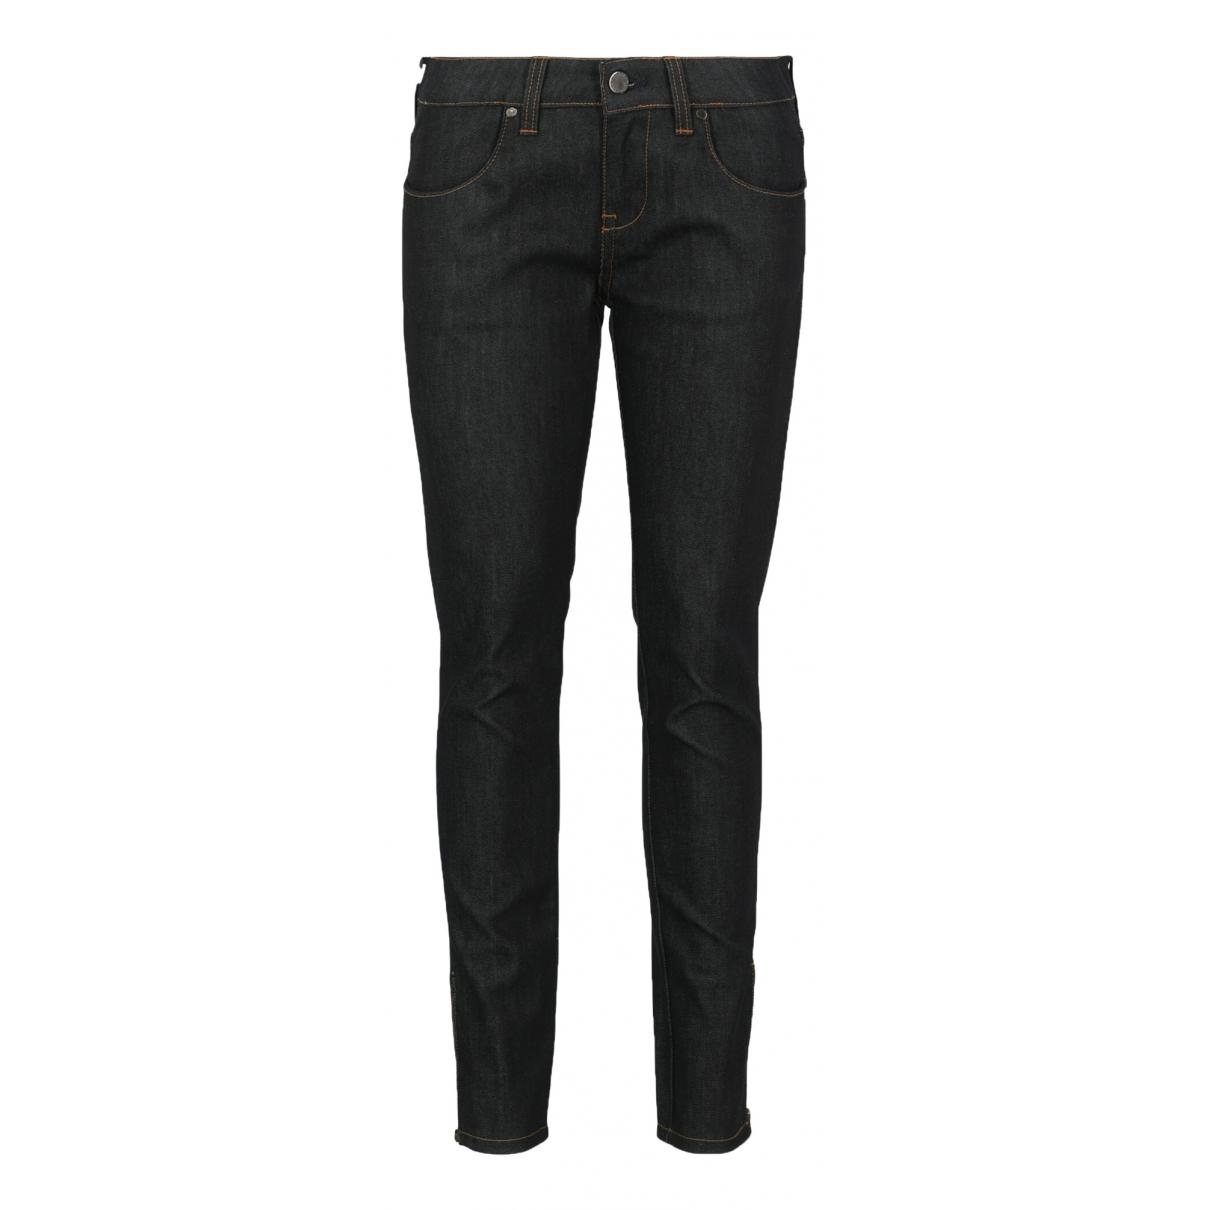 Stella Mccartney N Blue Cotton Jeans for Women M International